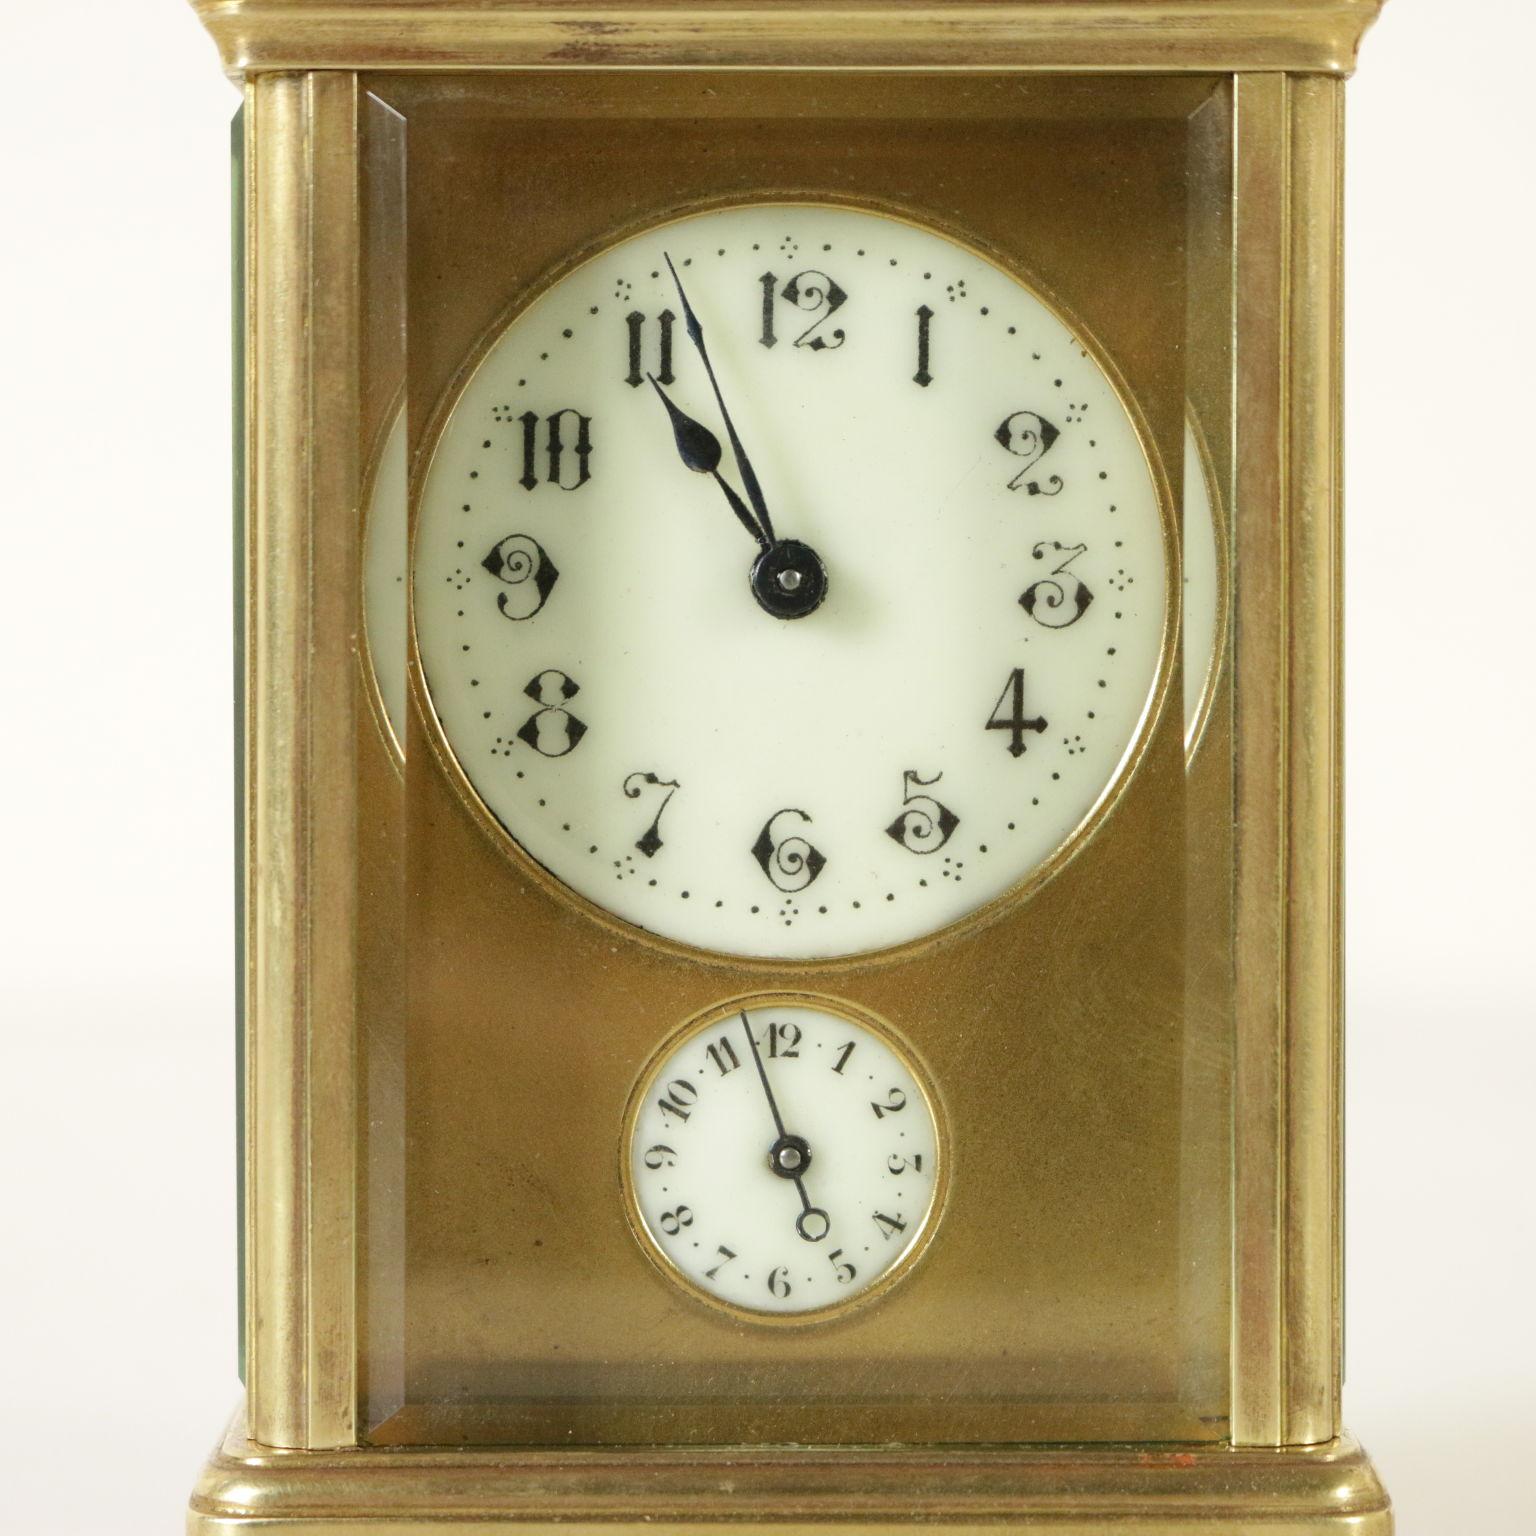 Datazione orologi francesi antichi